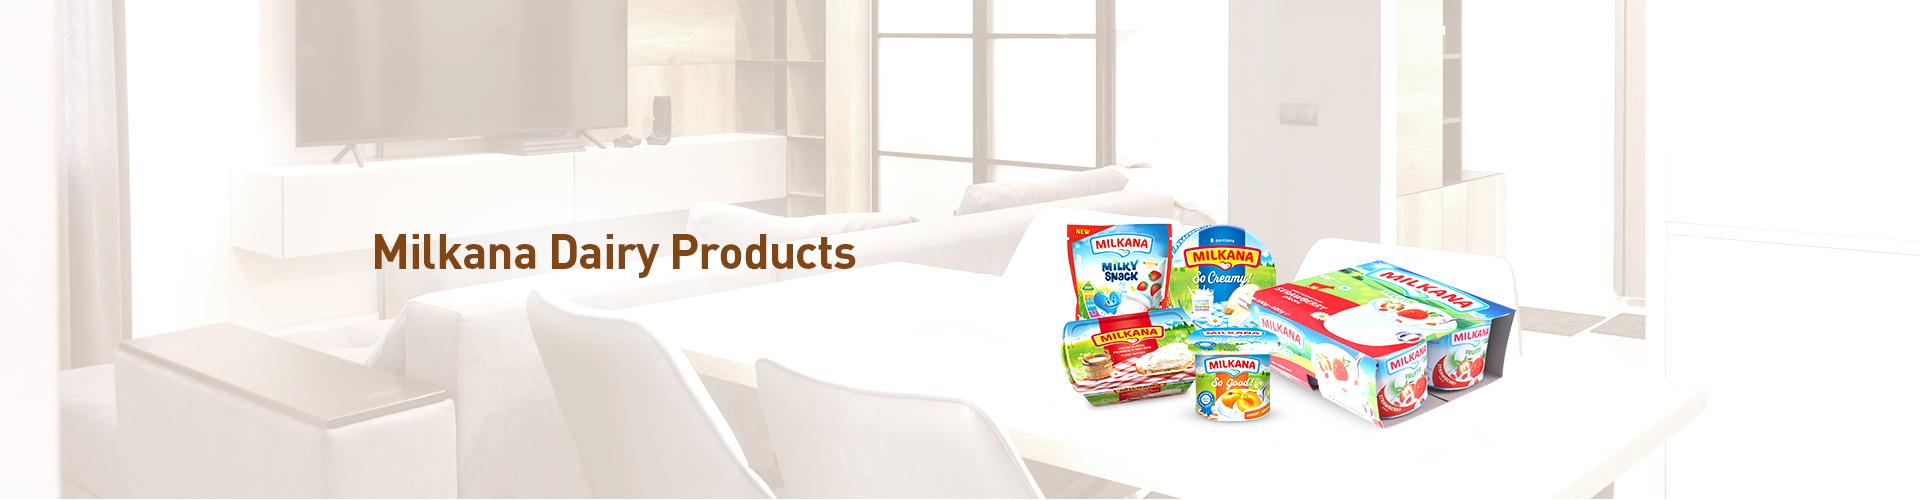 Milkana Dairy Products